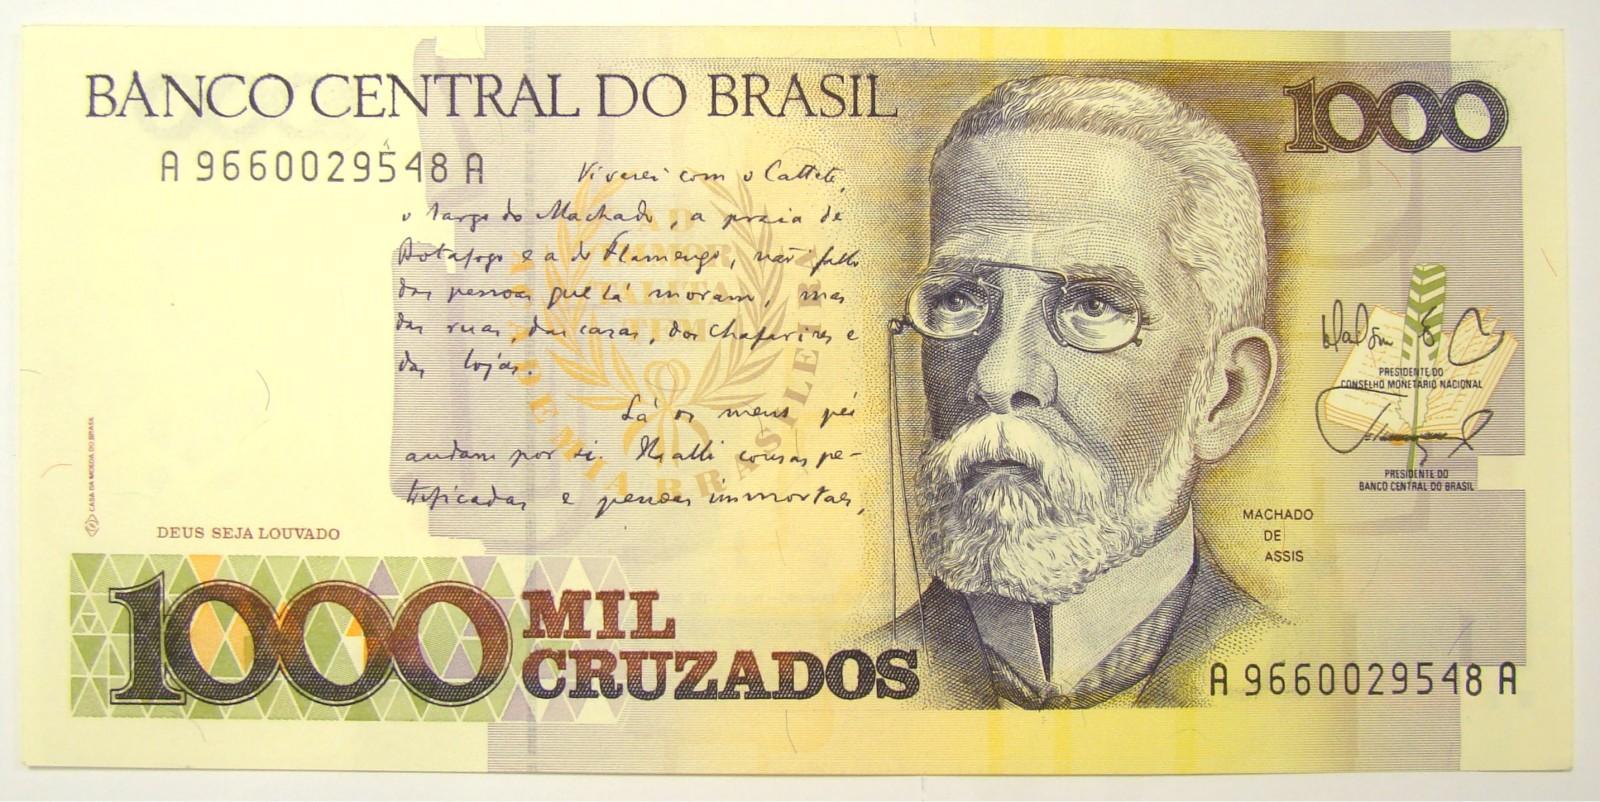 Роно бразилия ру 8 фотография